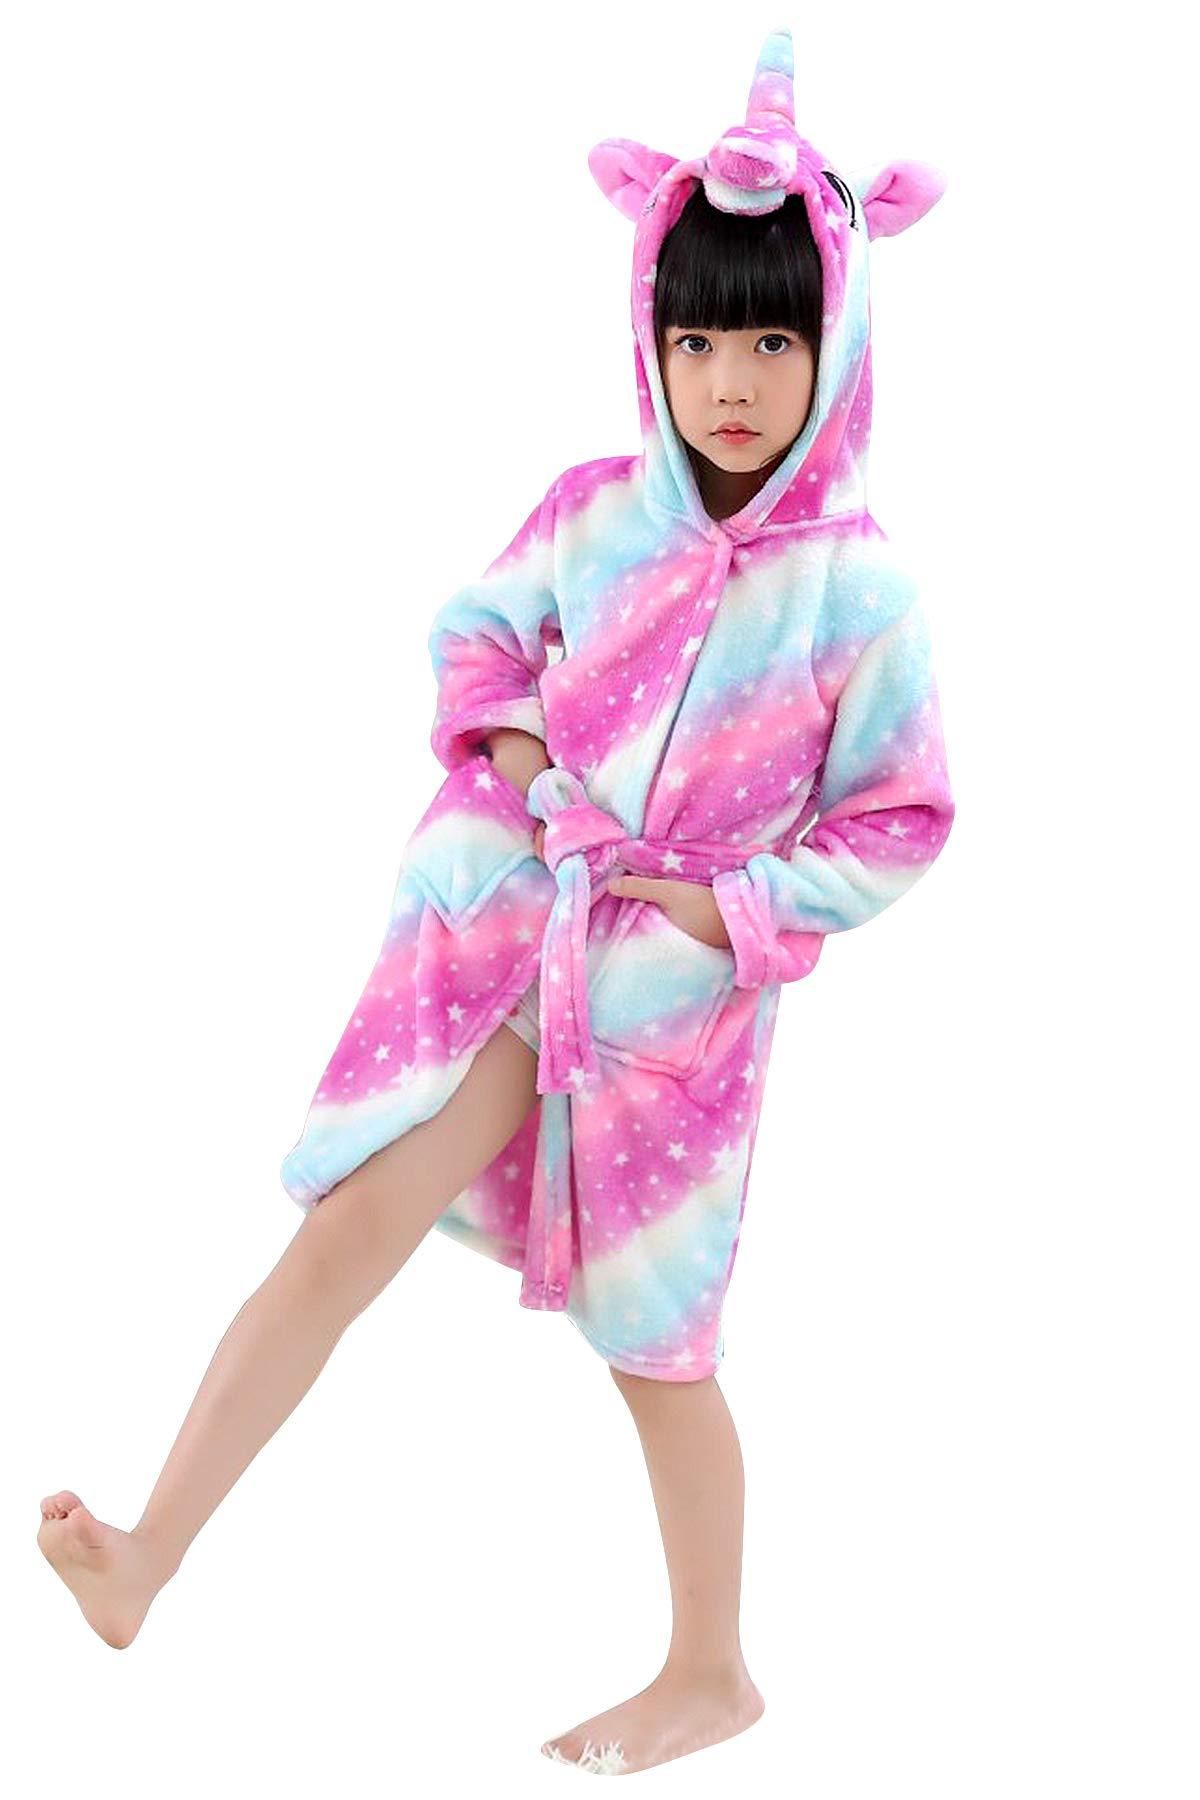 JOXJOZ Kids Unicorn Hooded Bathrobes Flannel Robe Pajamas Unisex Animal Sleepwear Gift (Galaxy, 110(Suggested Height39.4-43.3''))